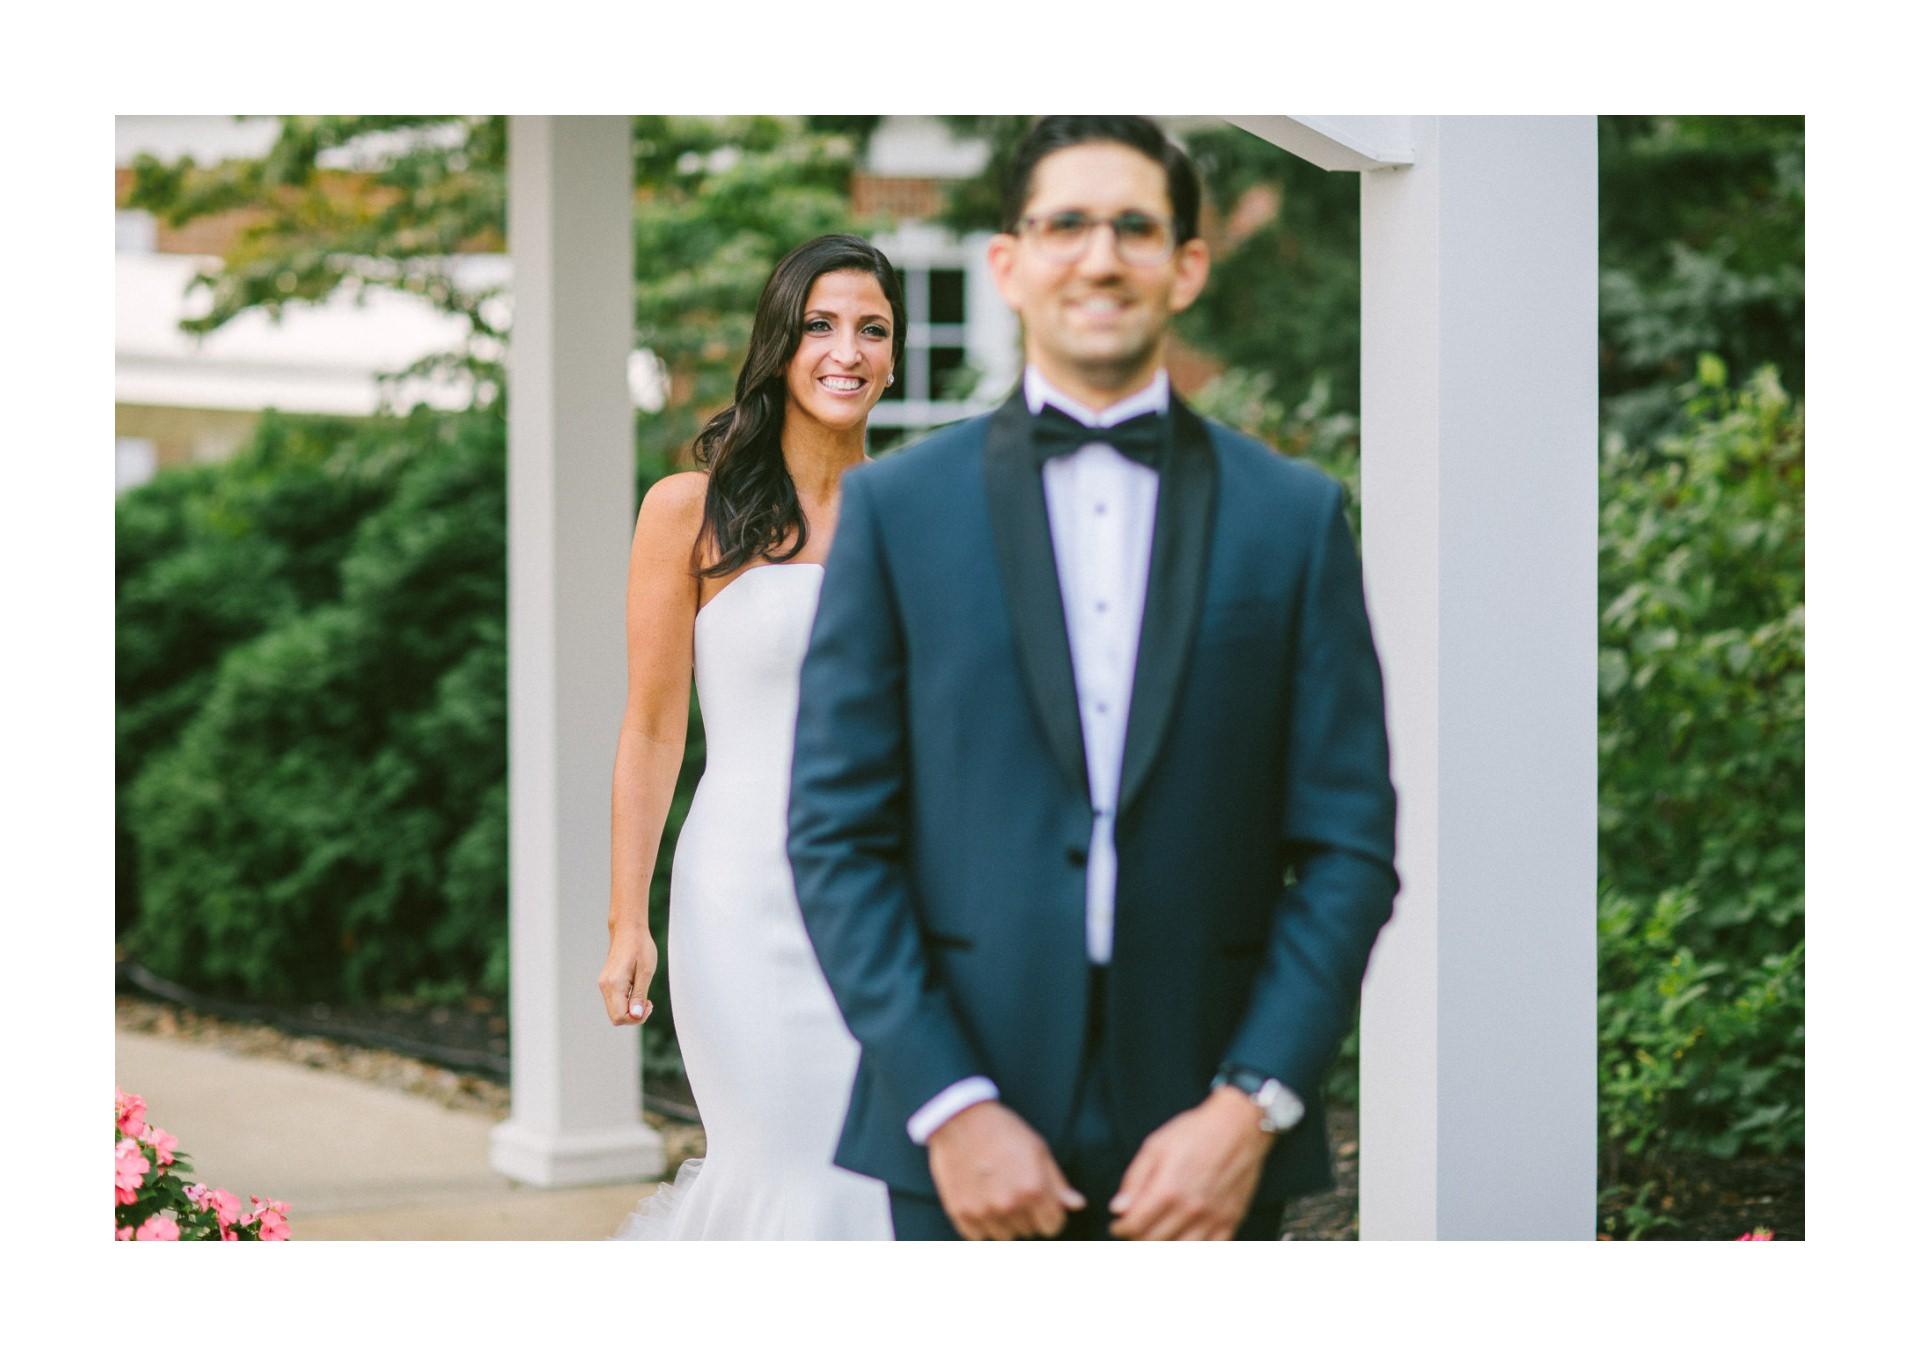 Beechmont Country Club Wedding Photographer in Beachwood 1 22.jpg